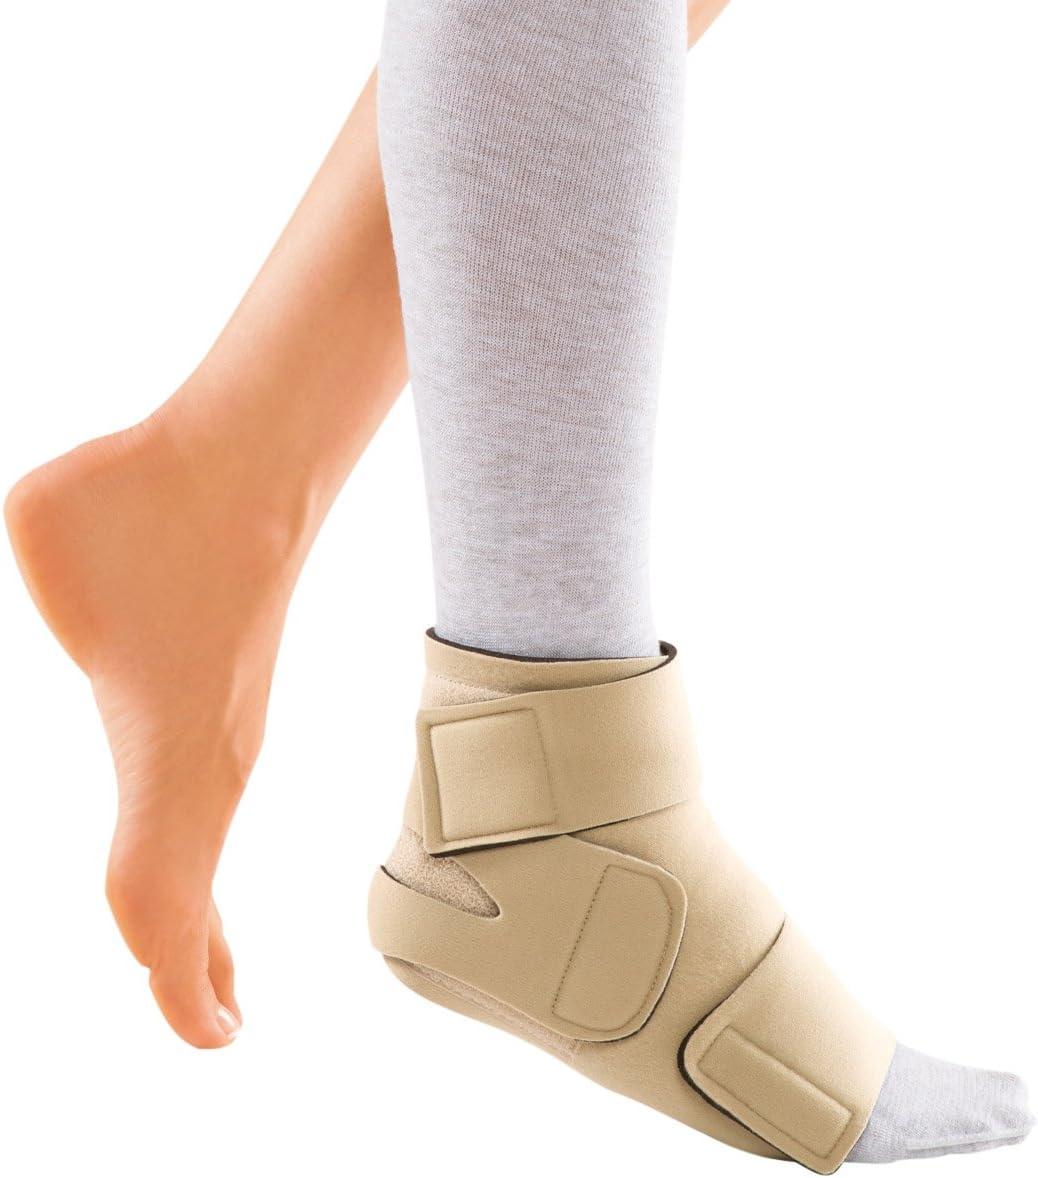 circaid Juxtafit Premium Seasonal Wrap Introduction Interlocking Ankle for Wrap pain Indefinitely r Foot